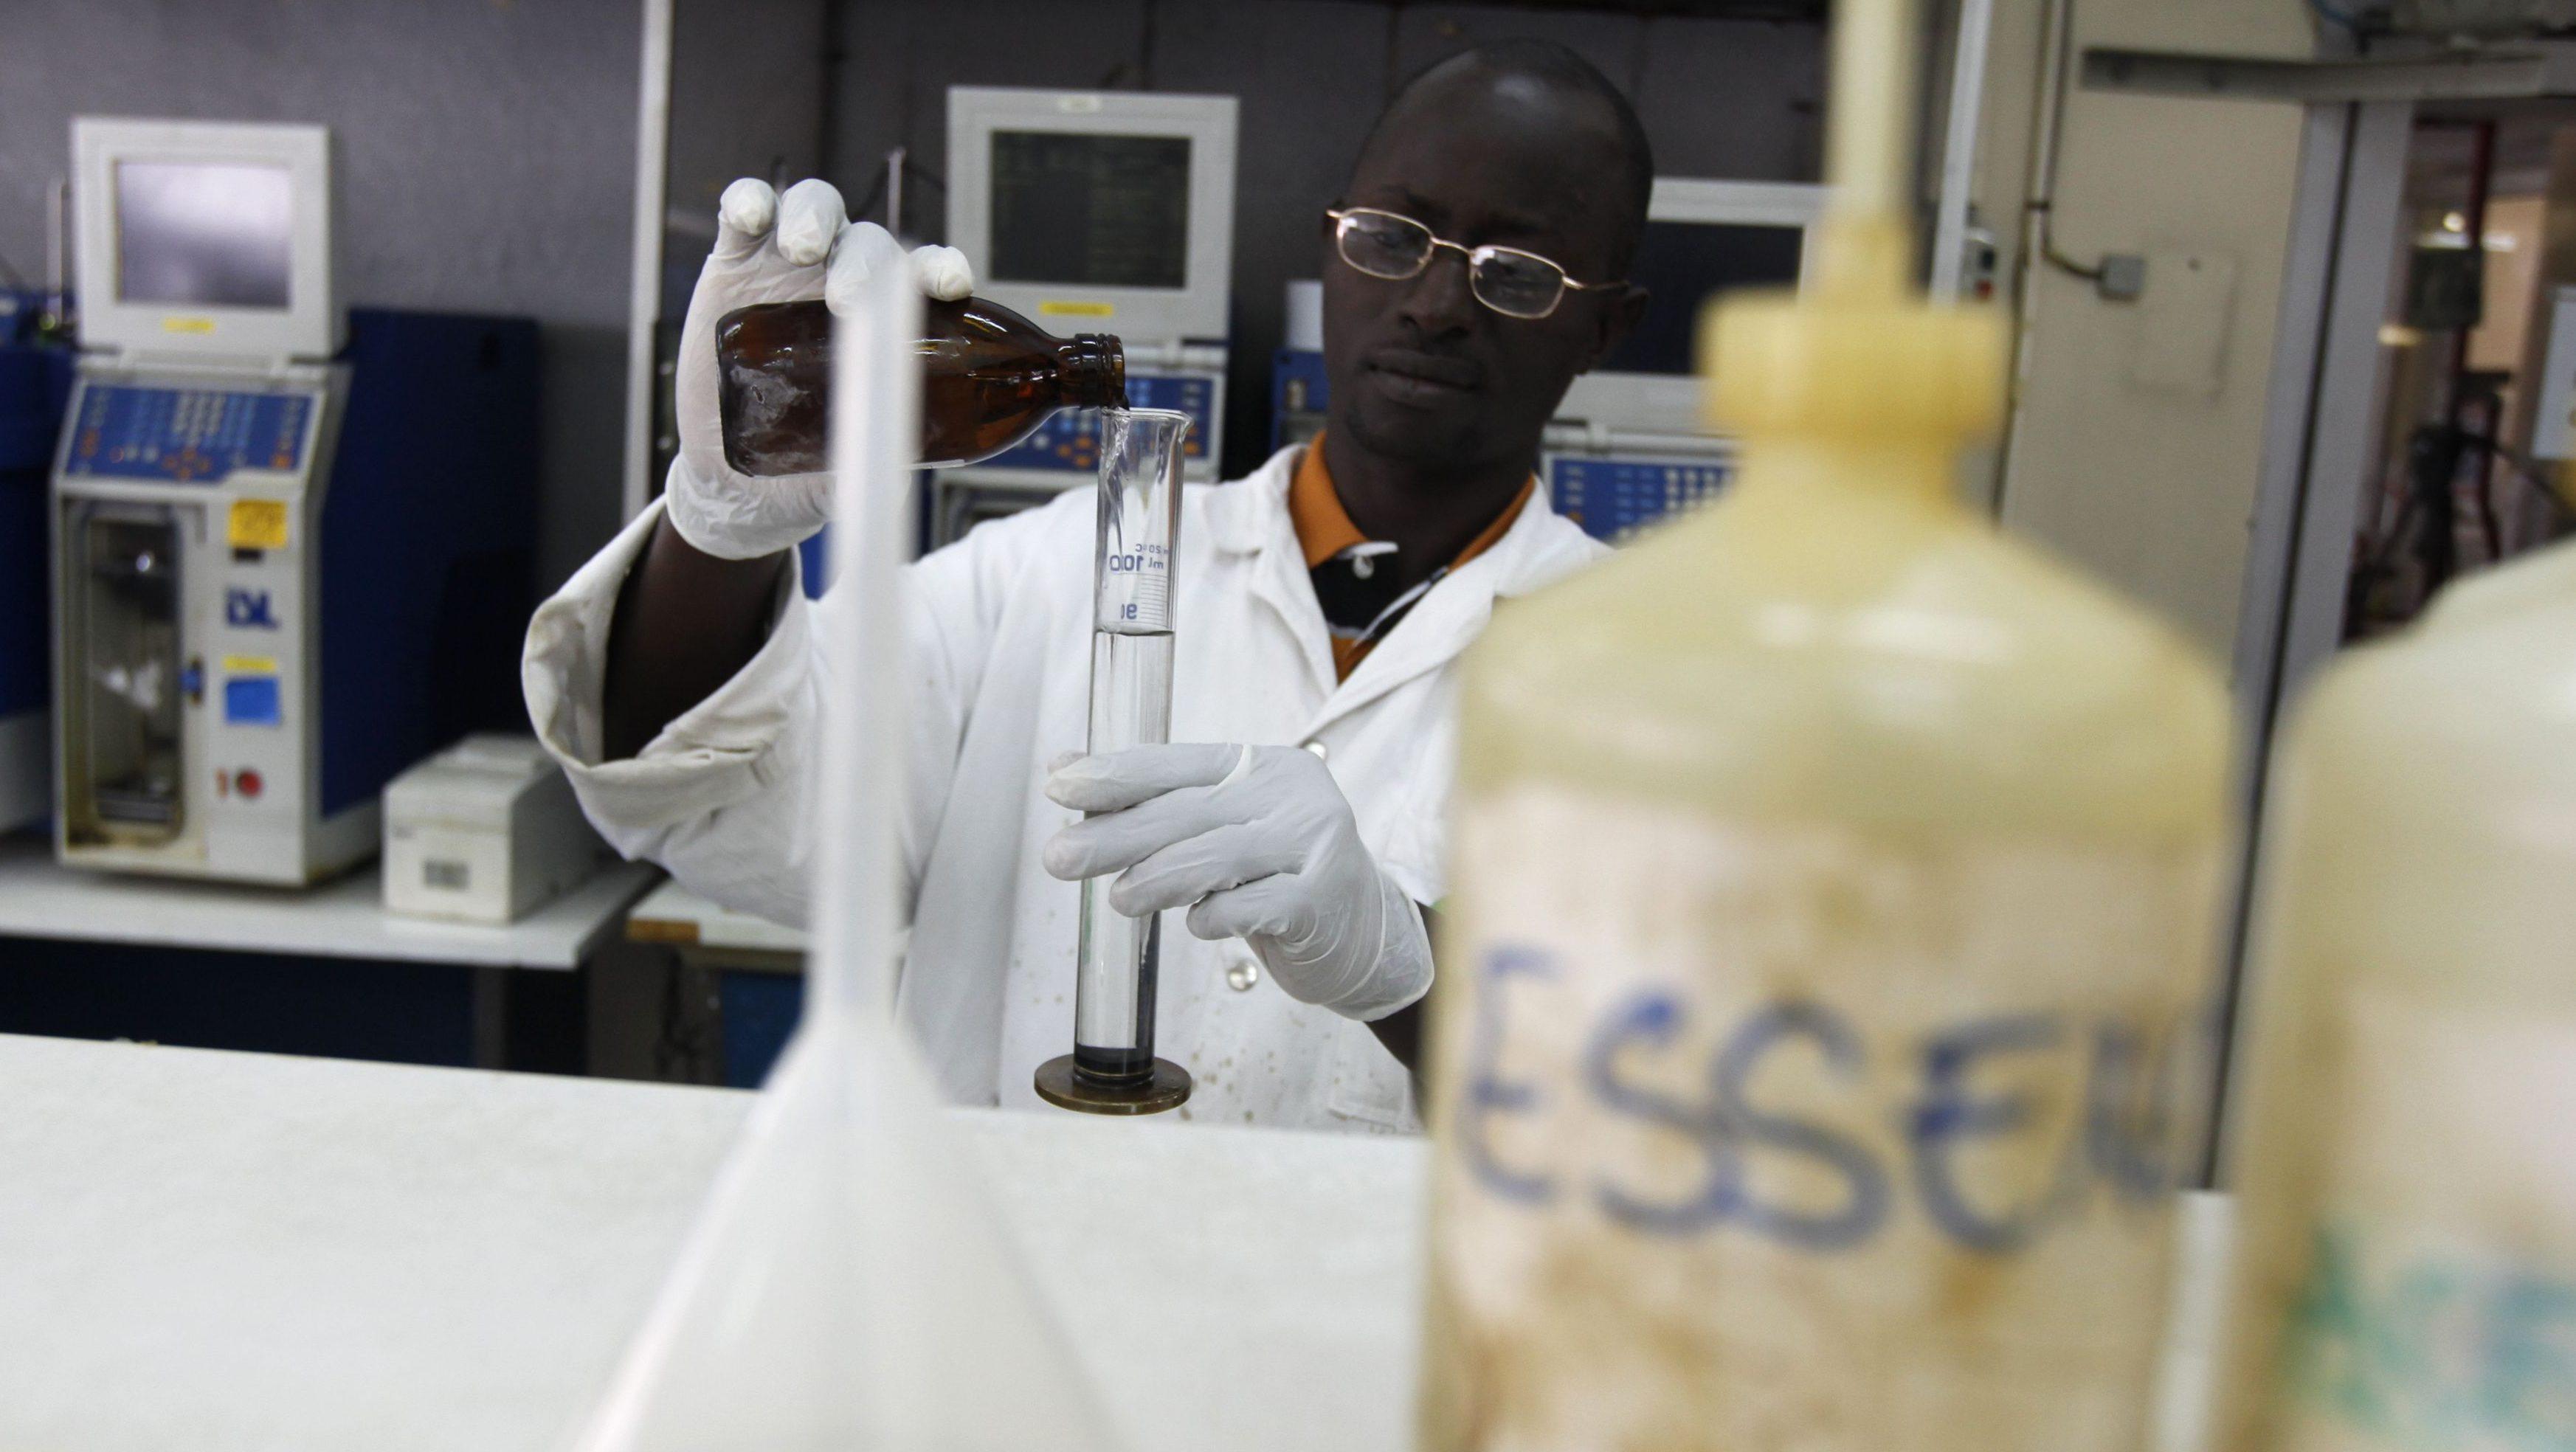 Africa's student laboratories design their own lab equipment